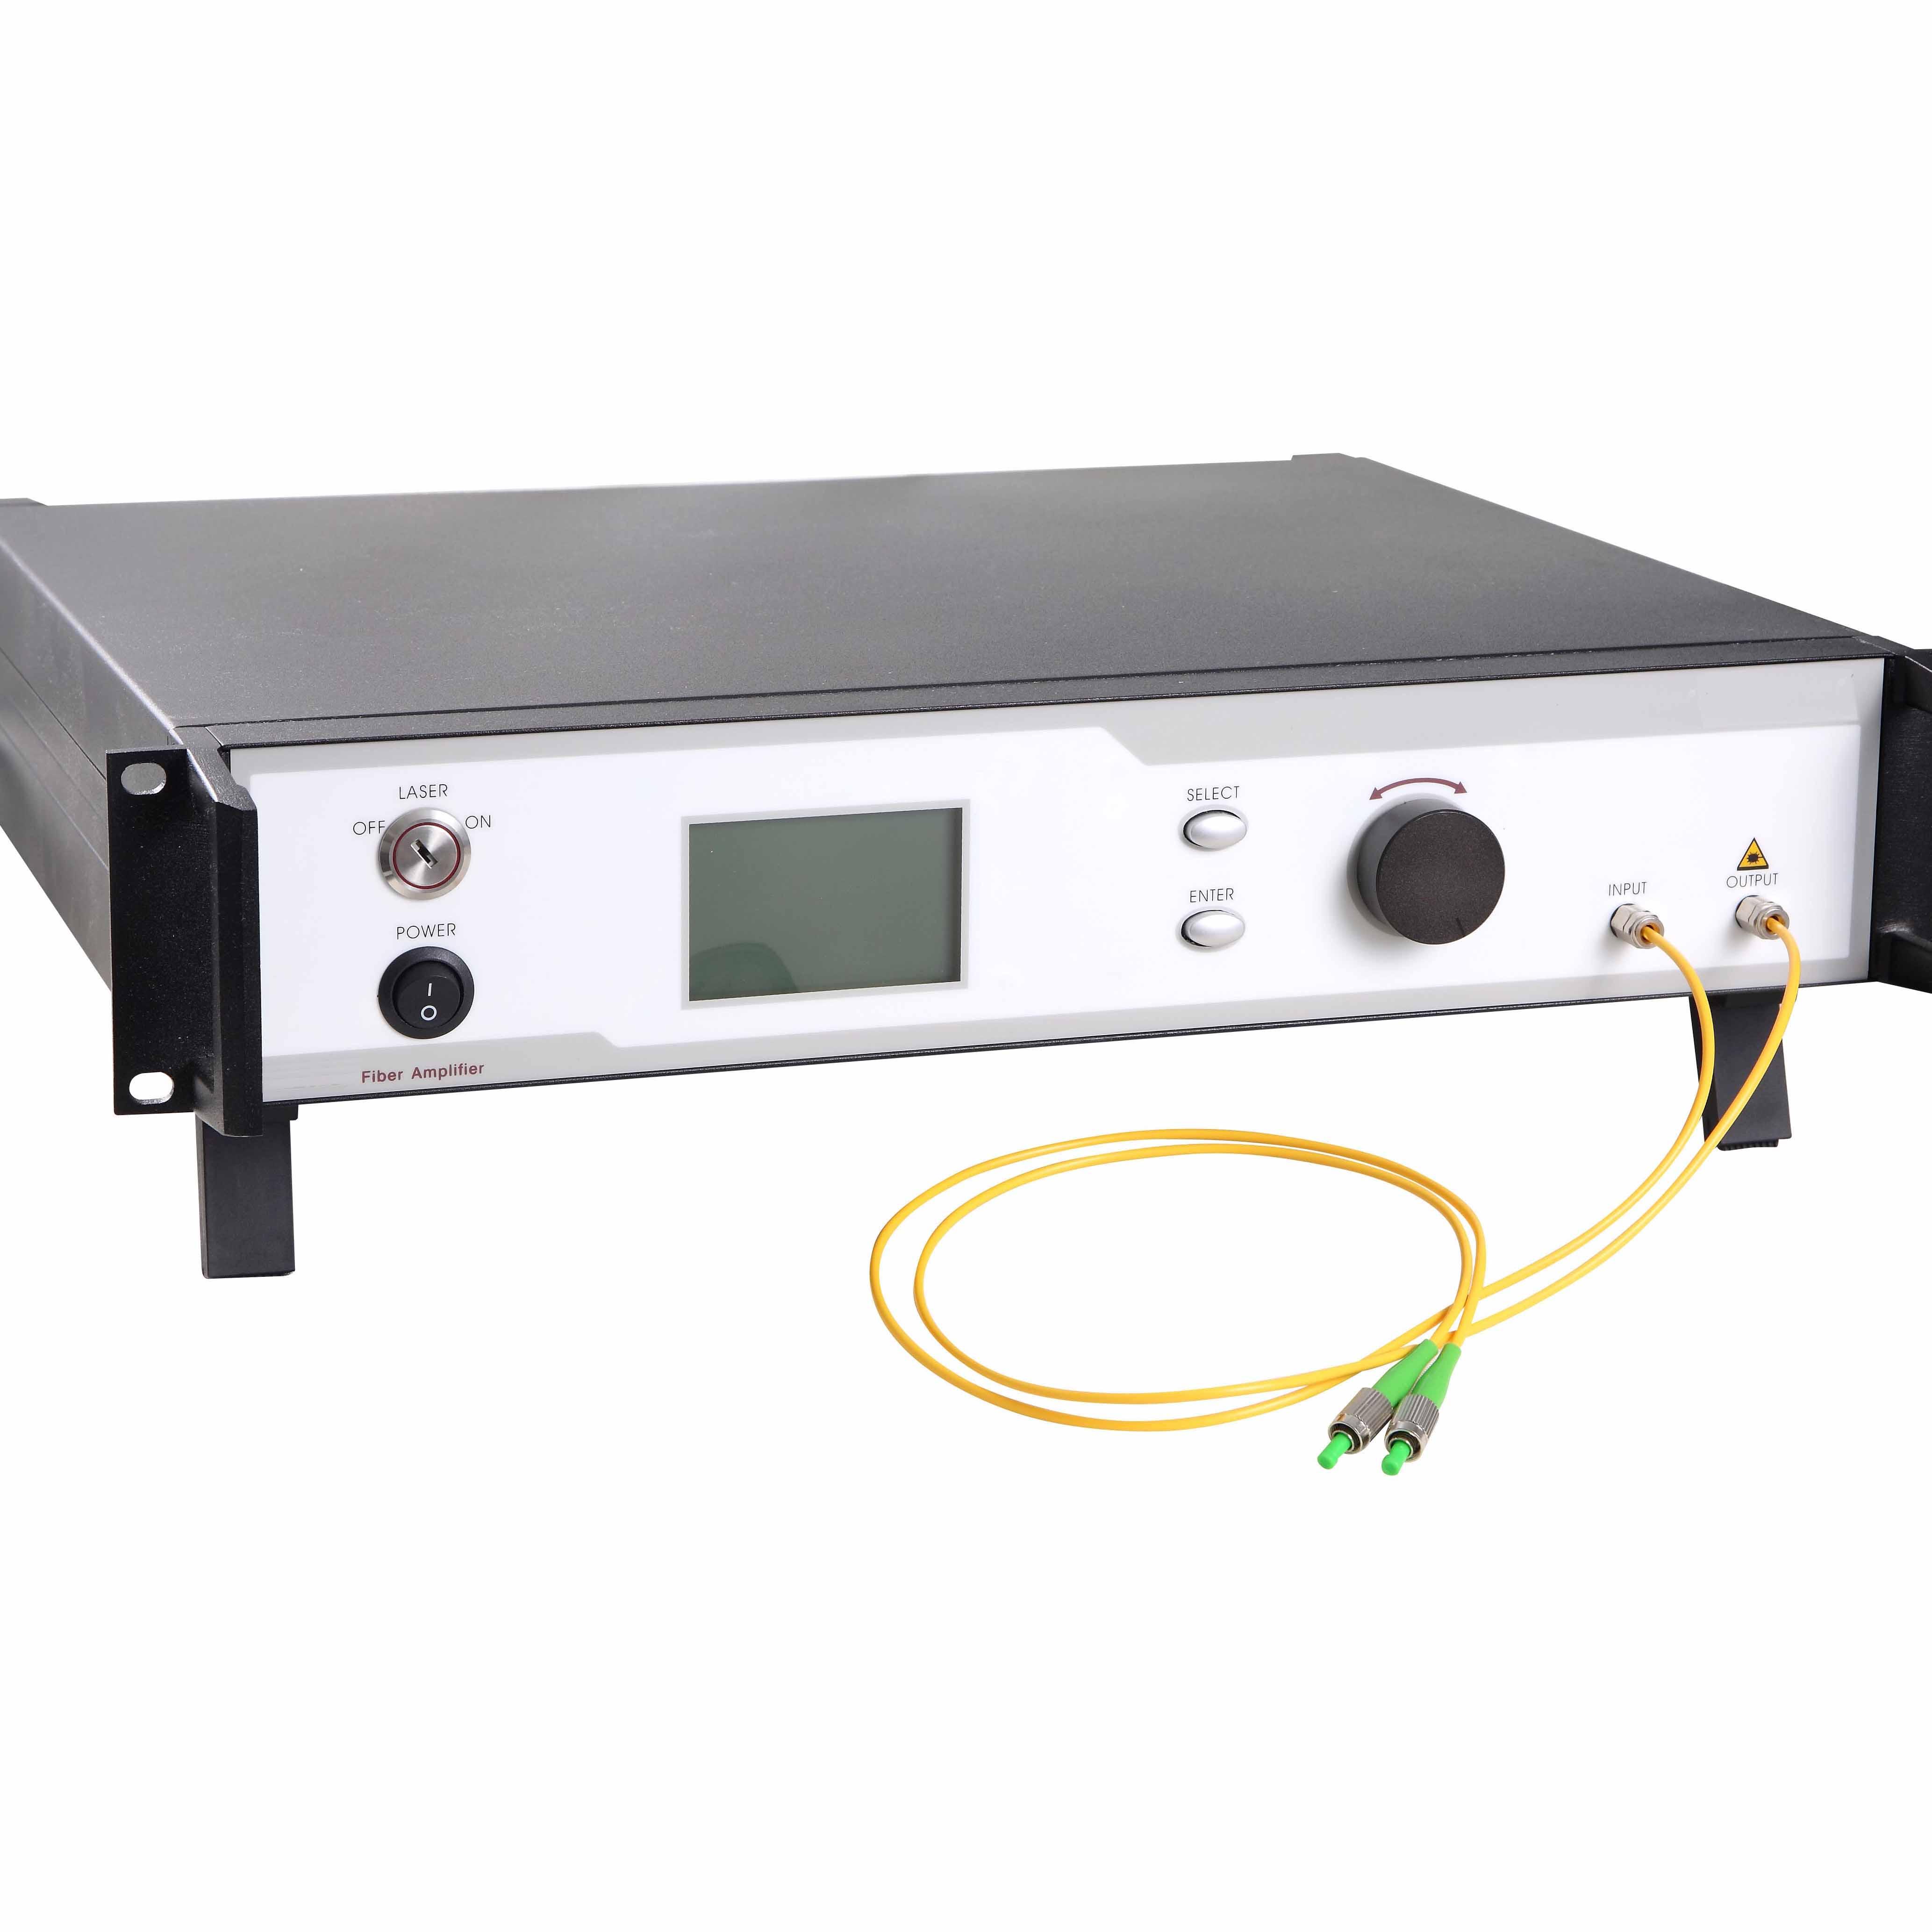 C波段功率掺铒光纤放大器(23dBm)